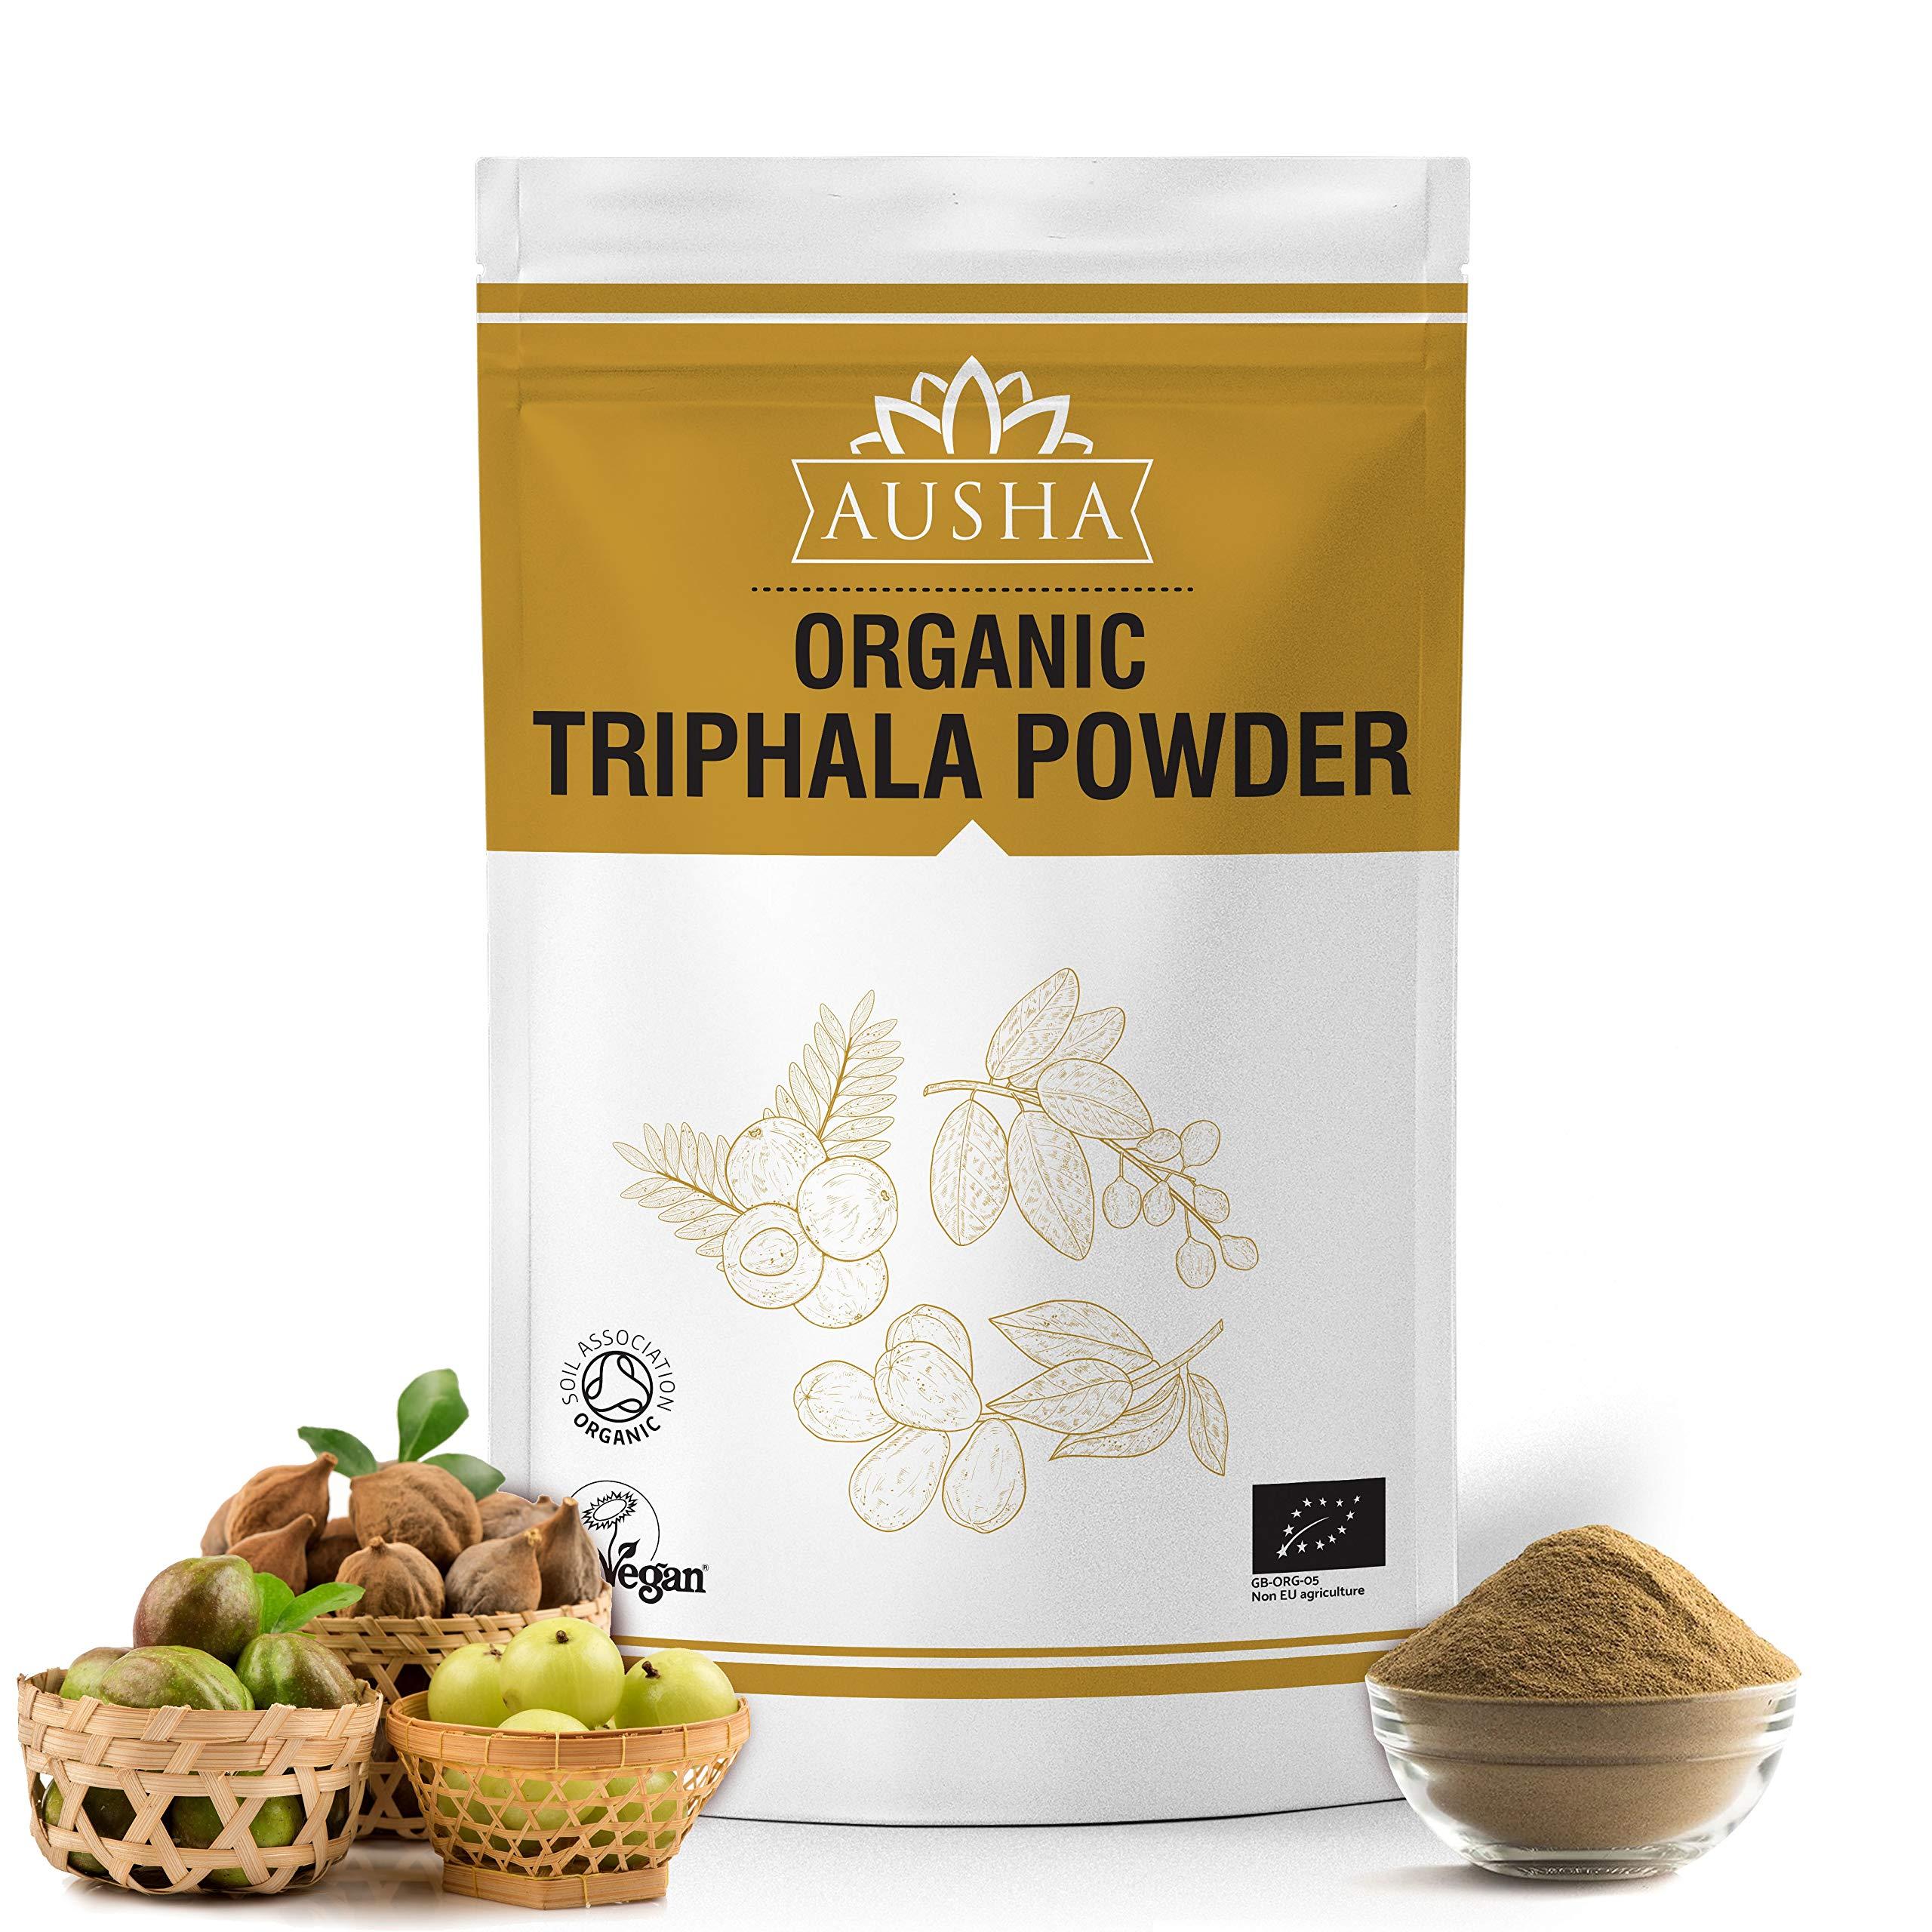 Ausha Organic Triphala Powder 250g | Blend of Amla,Haritaki,Bibhitaki | Certified Organic by Soil Association | Vitamin C,Aid Digestion, Detox, Immunity